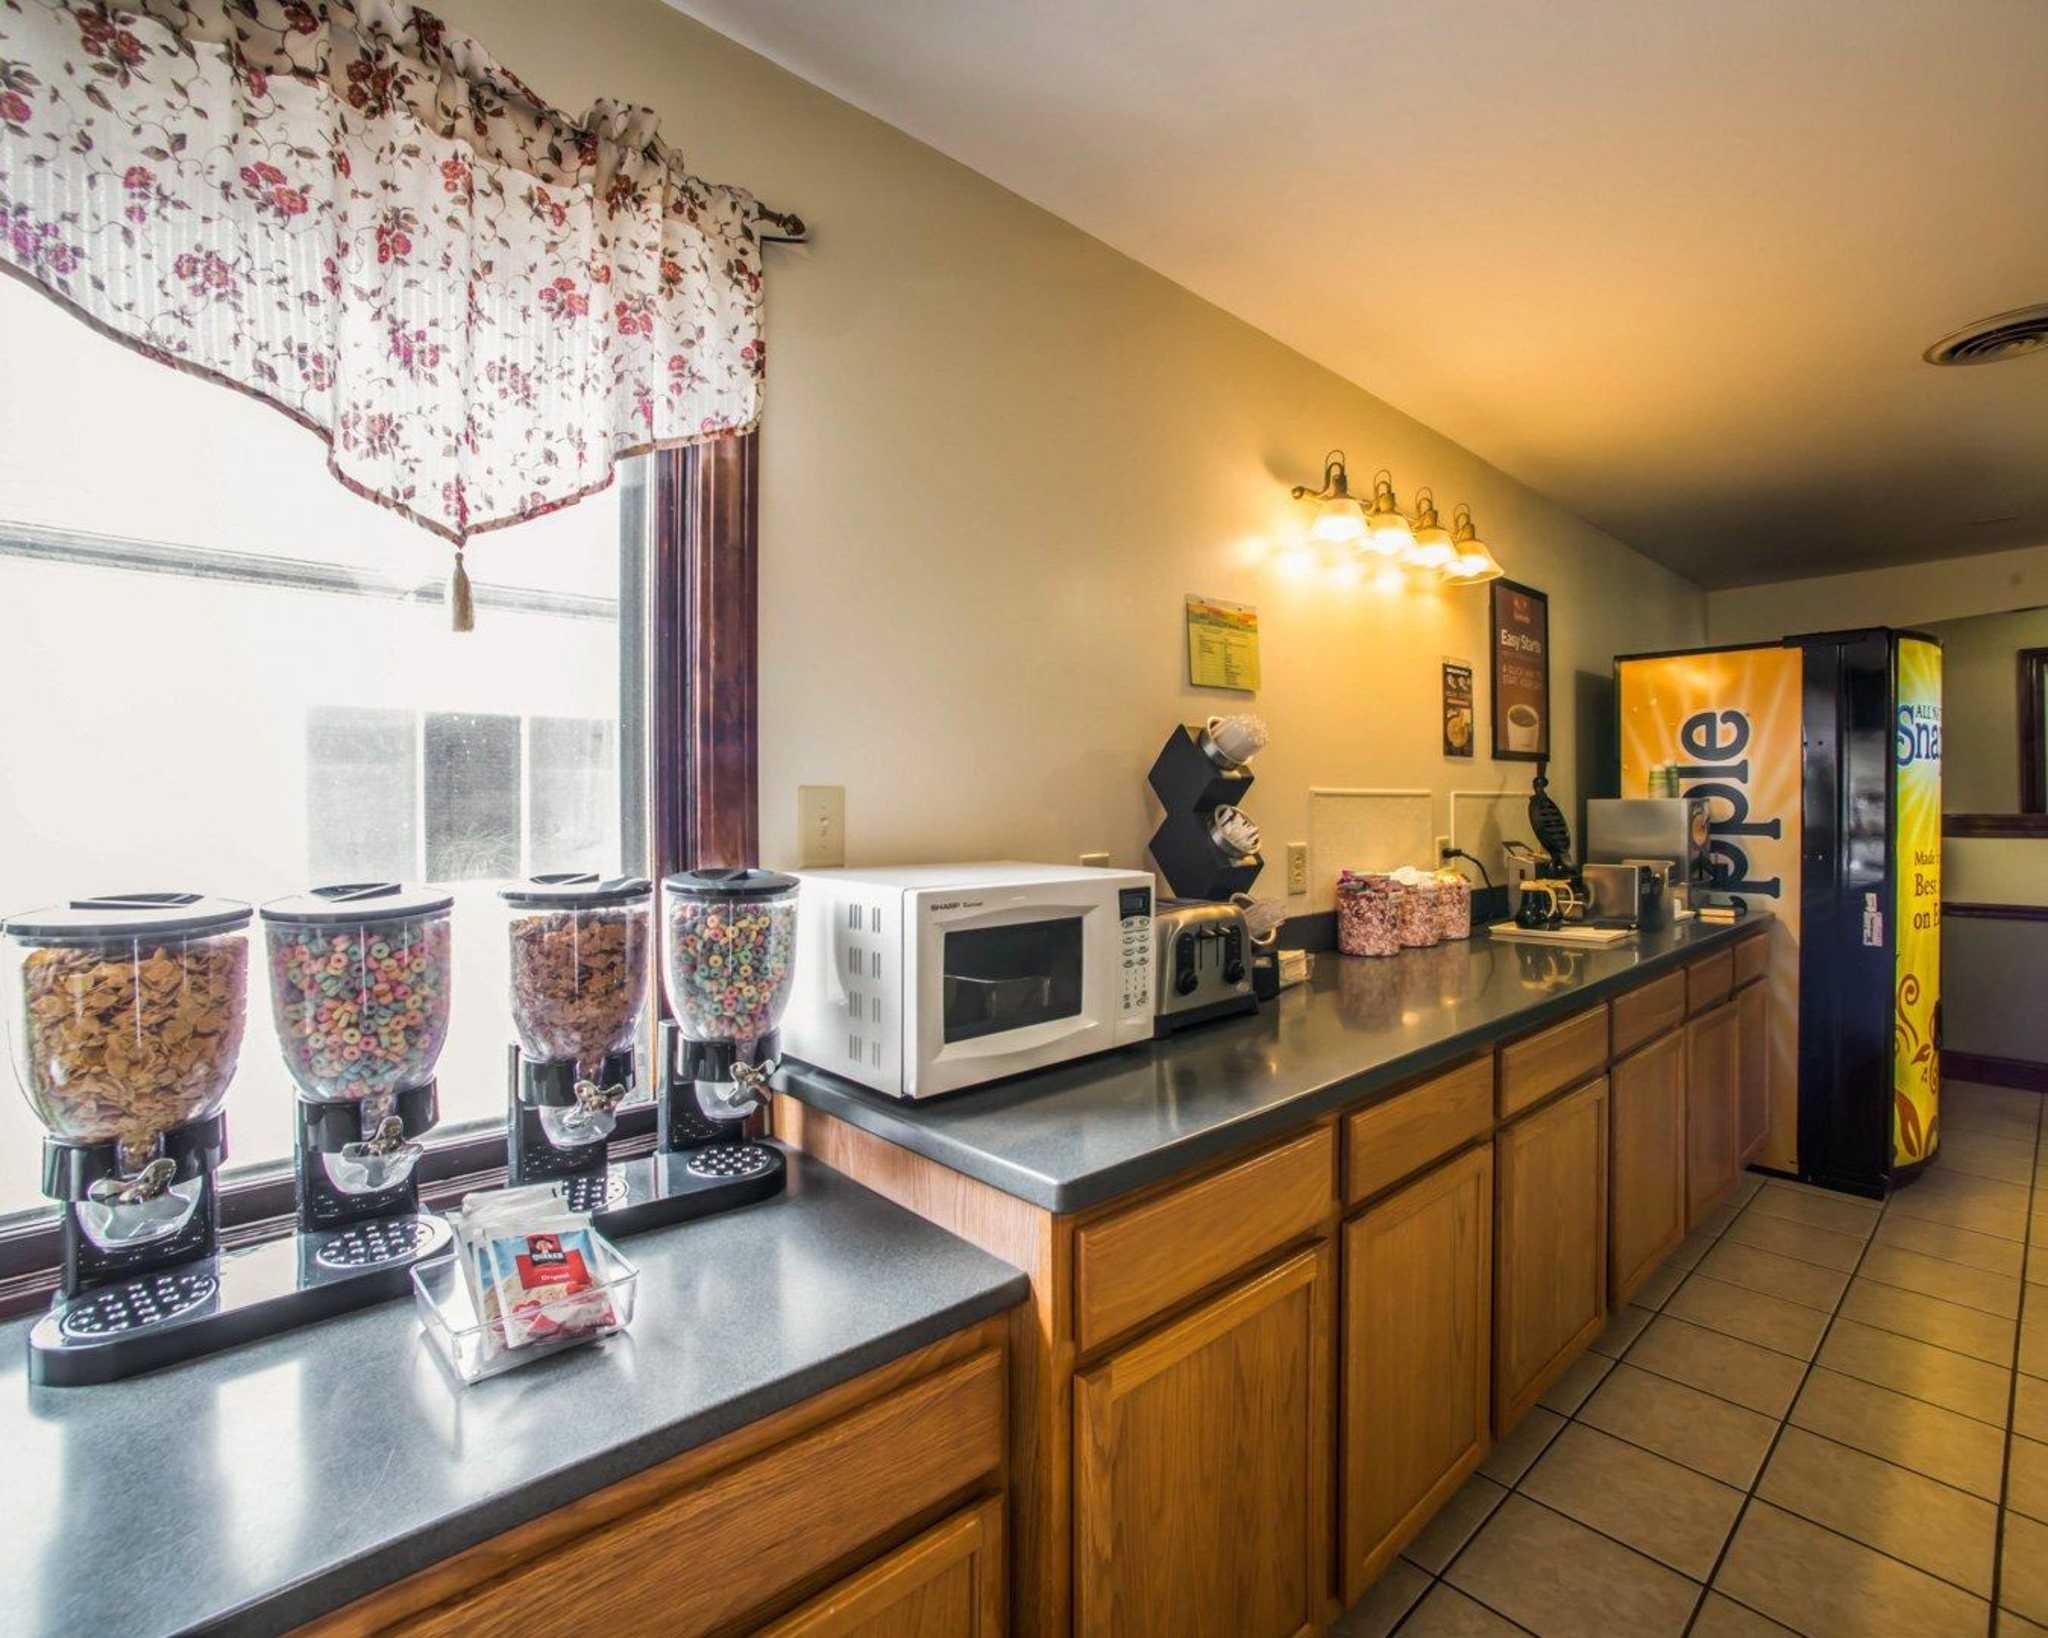 Econo Lodge Inn & Suites image 33